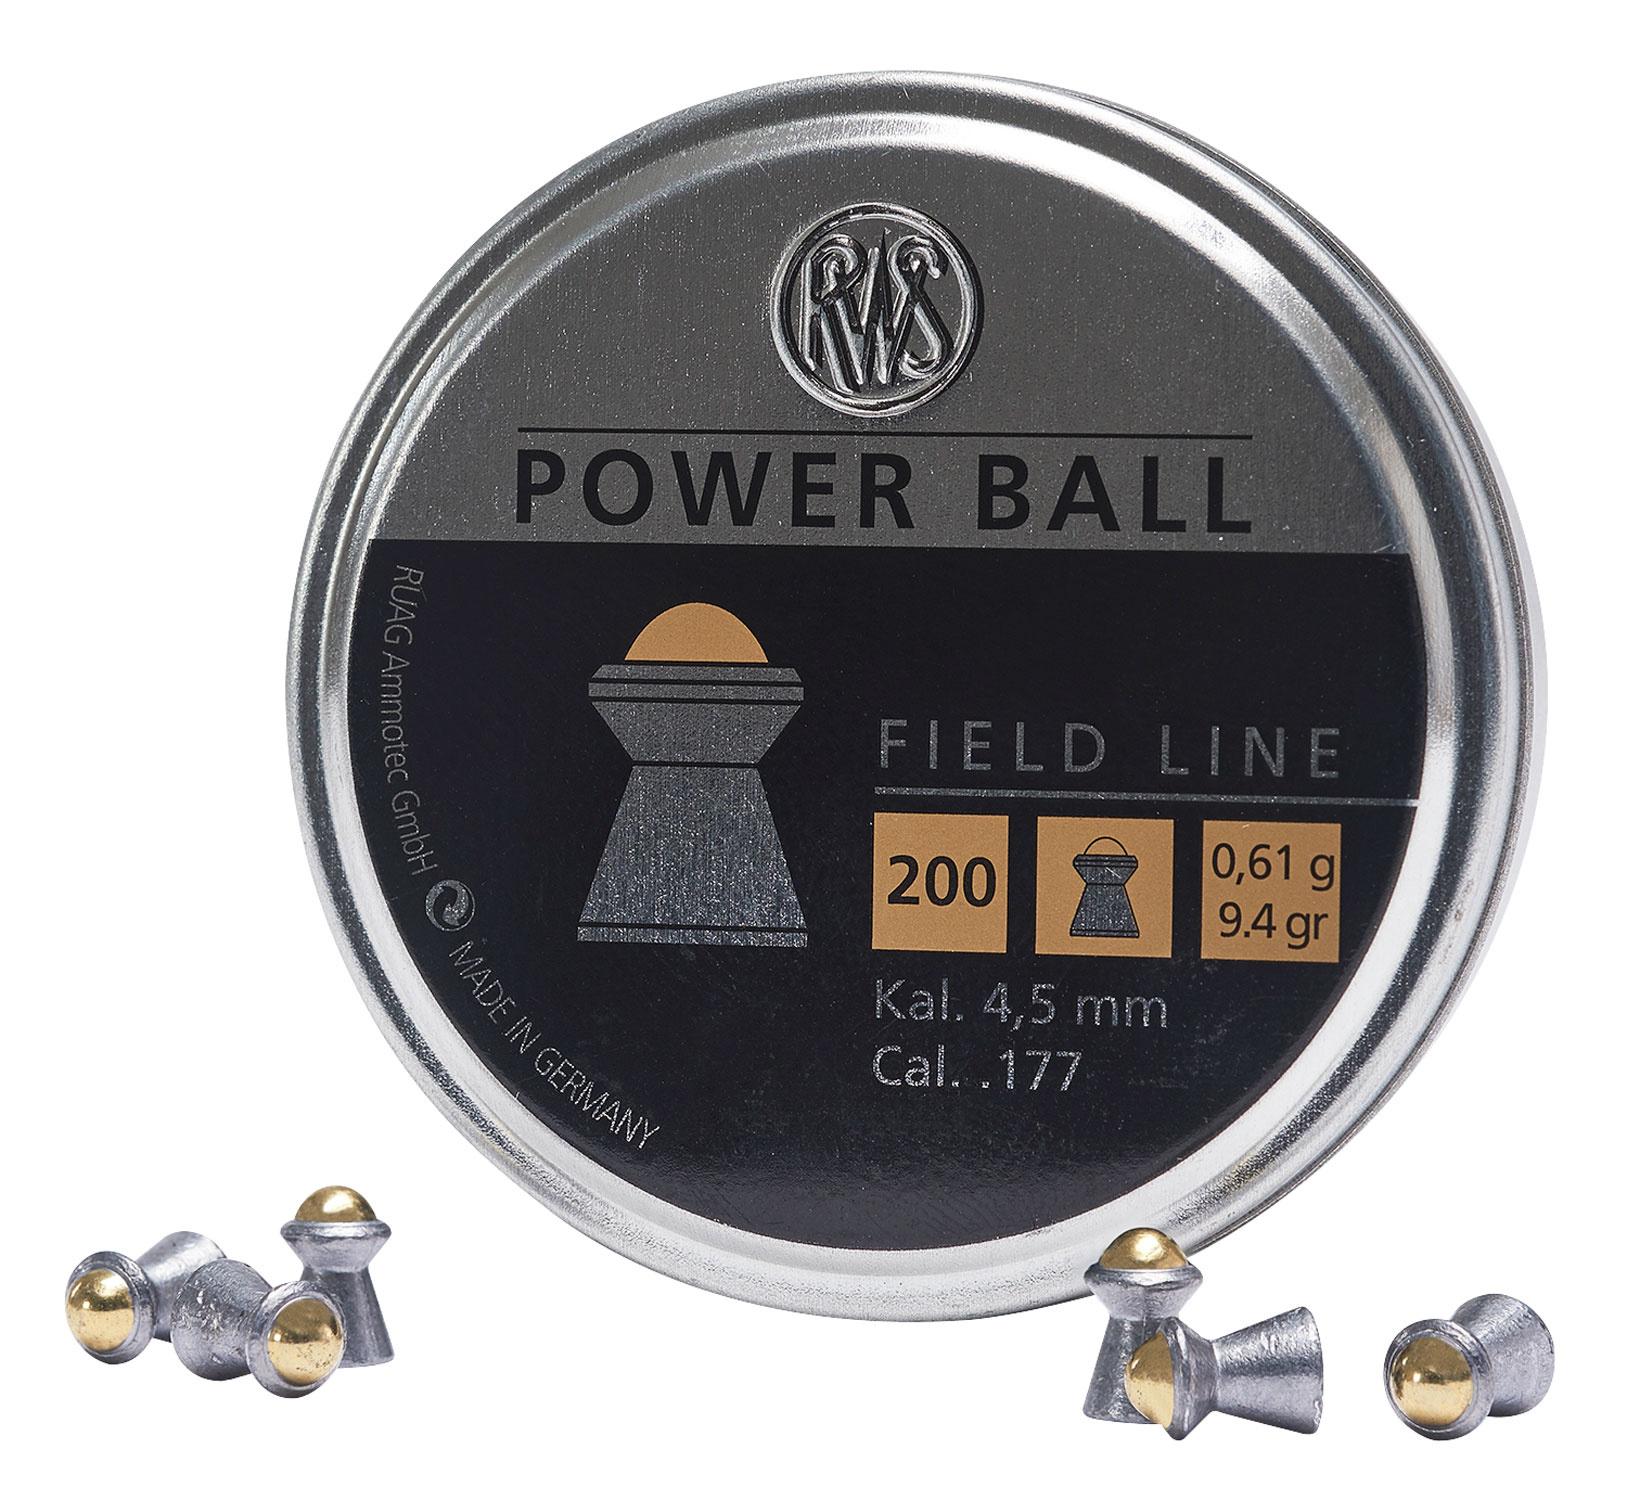 RWS .177 Cal Power Ball Pellets 9.4 Grain (200 Count)